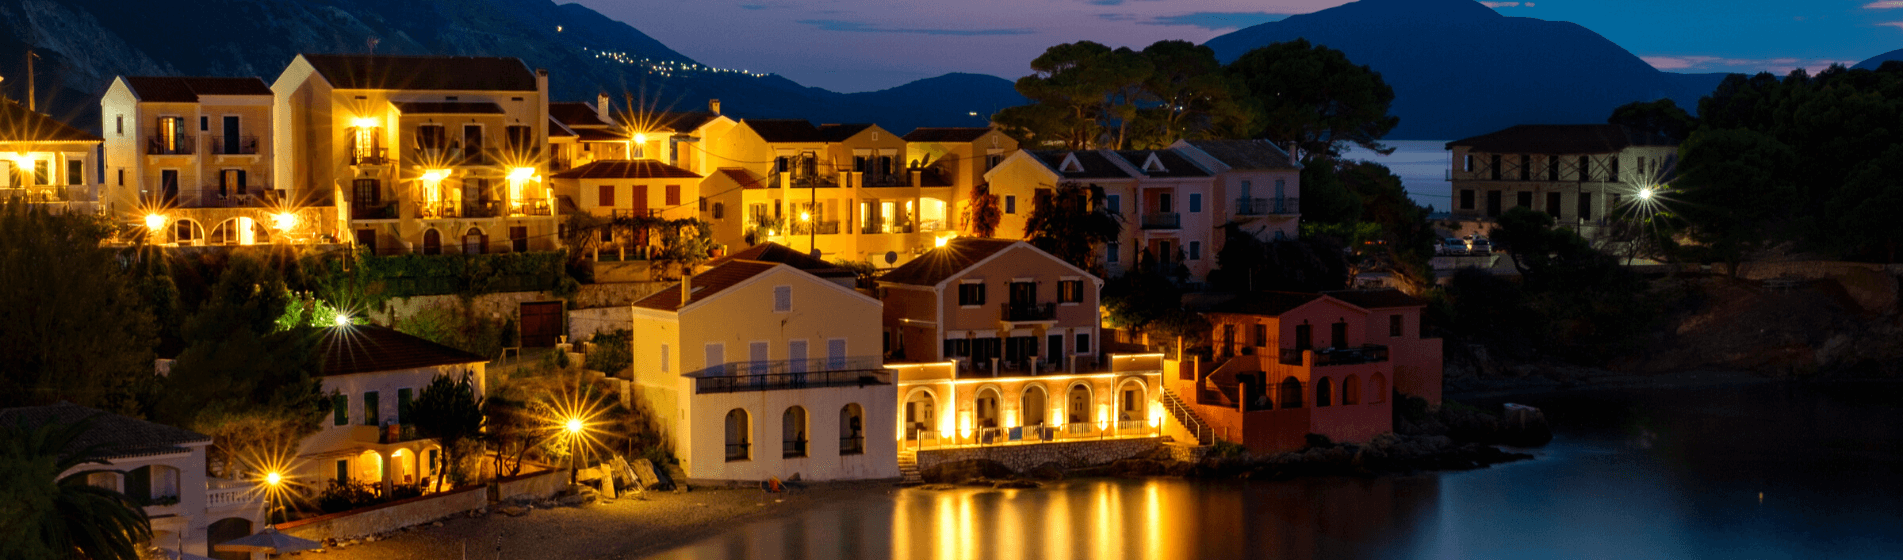 6 European investor residency programs for real estate investors